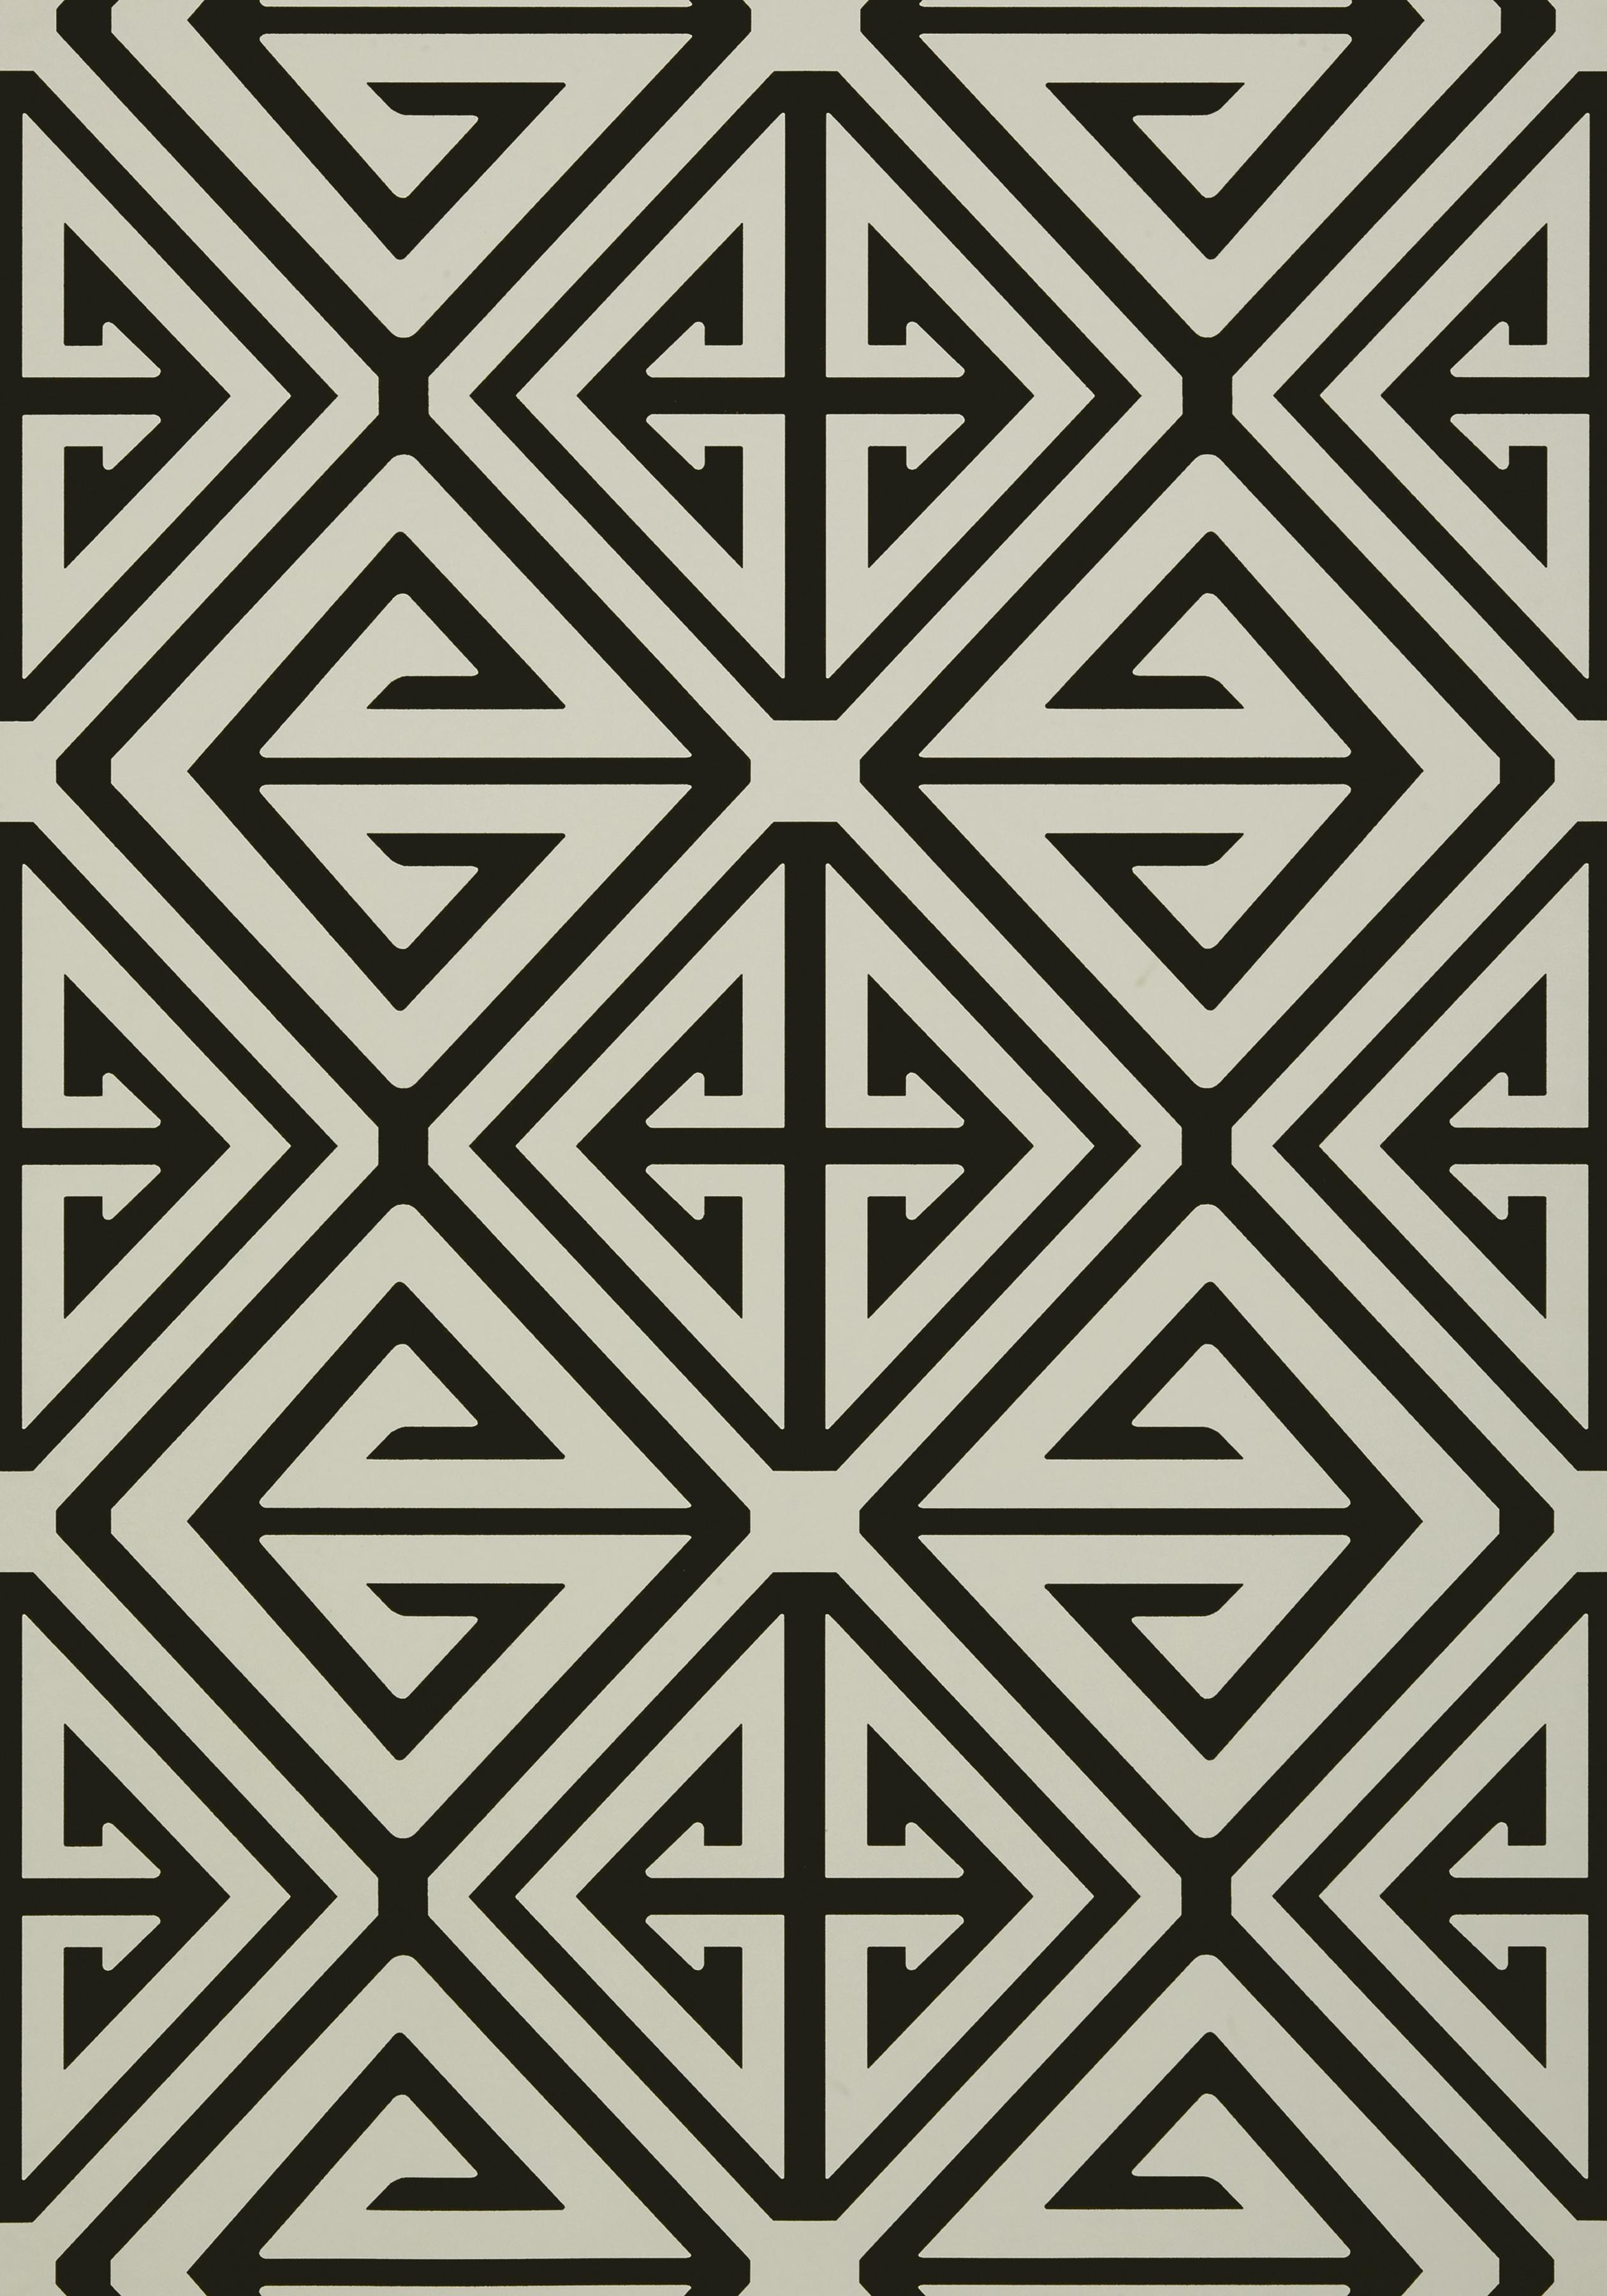 DEMETRIUS-Black-T-Collection-Bridgehampton-from-Thibaut-wallpaper-wp424917-1